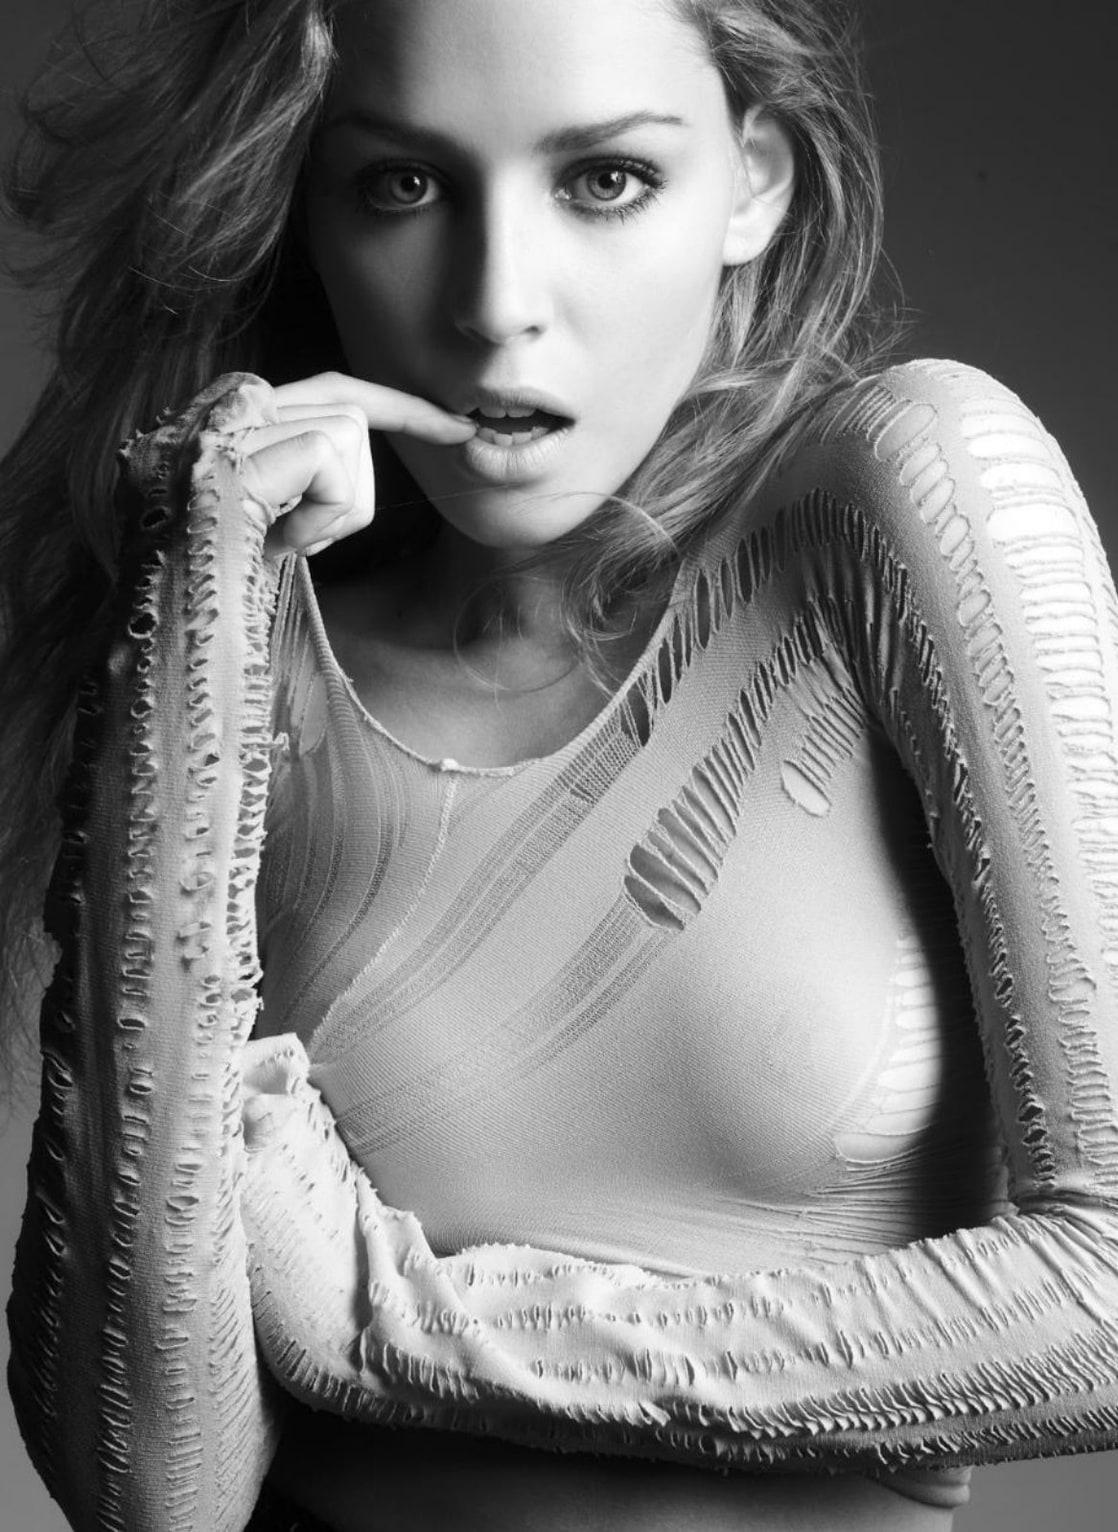 Jasmin walia tits,Pamela anderson nip slip 47 photos Hot archive Jess Southern Nude Photos Videos,Megan Fox Emporio Armani Underwear Pictures